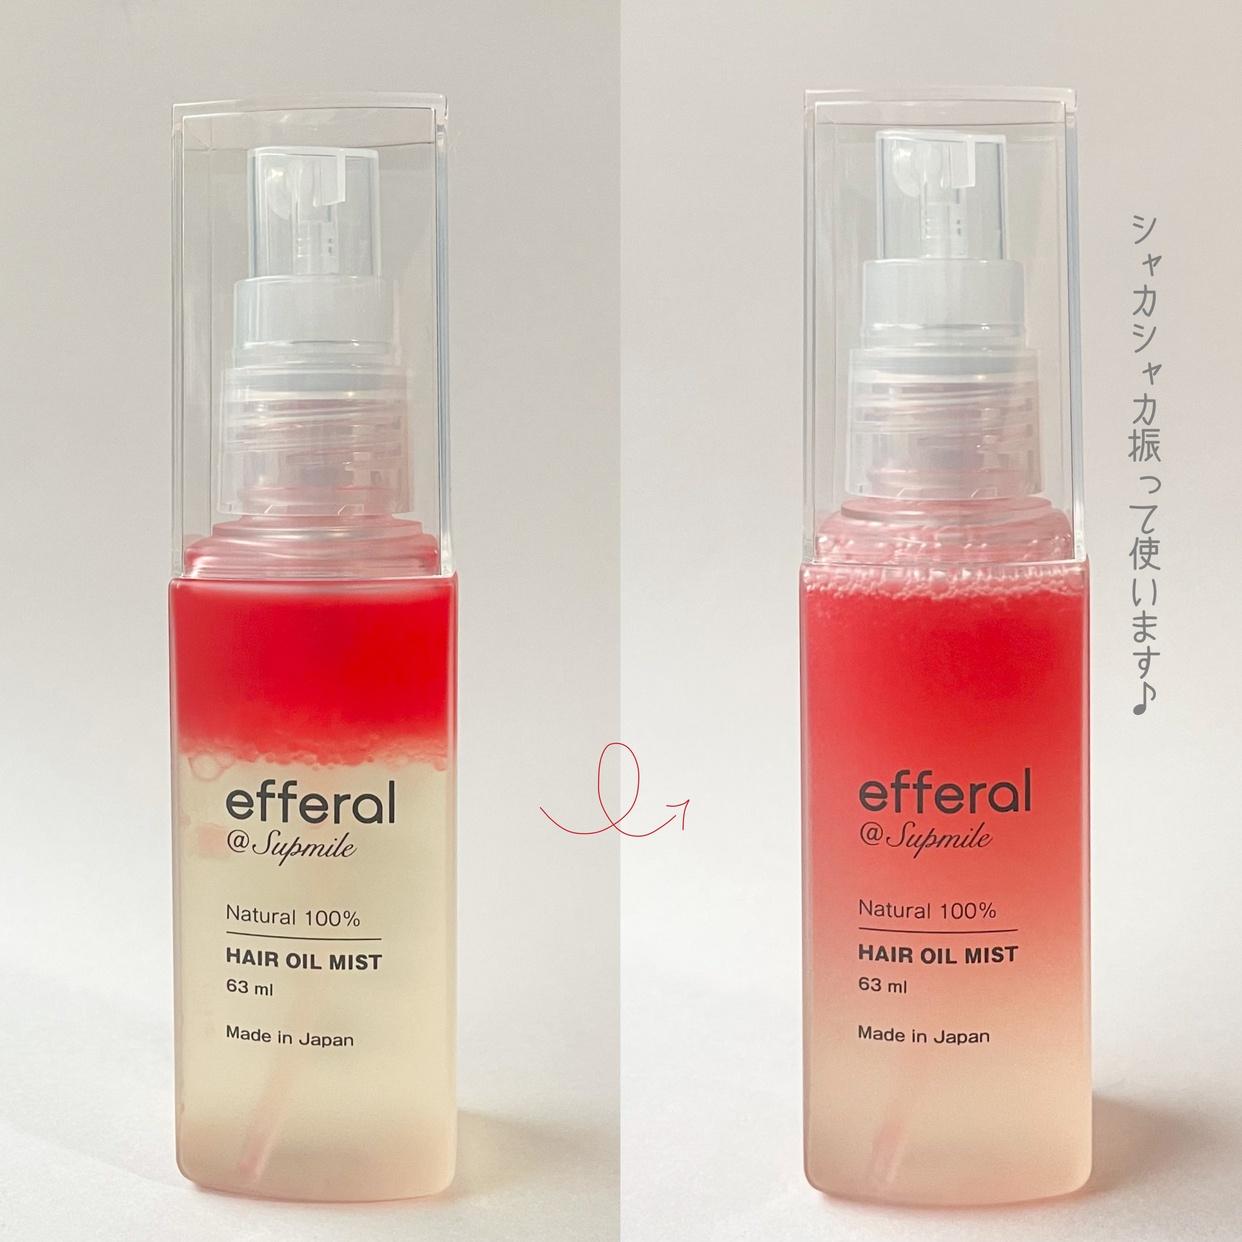 efferal(エフェラル)ヘアオイルミストを使ったあひるさんのクチコミ画像4